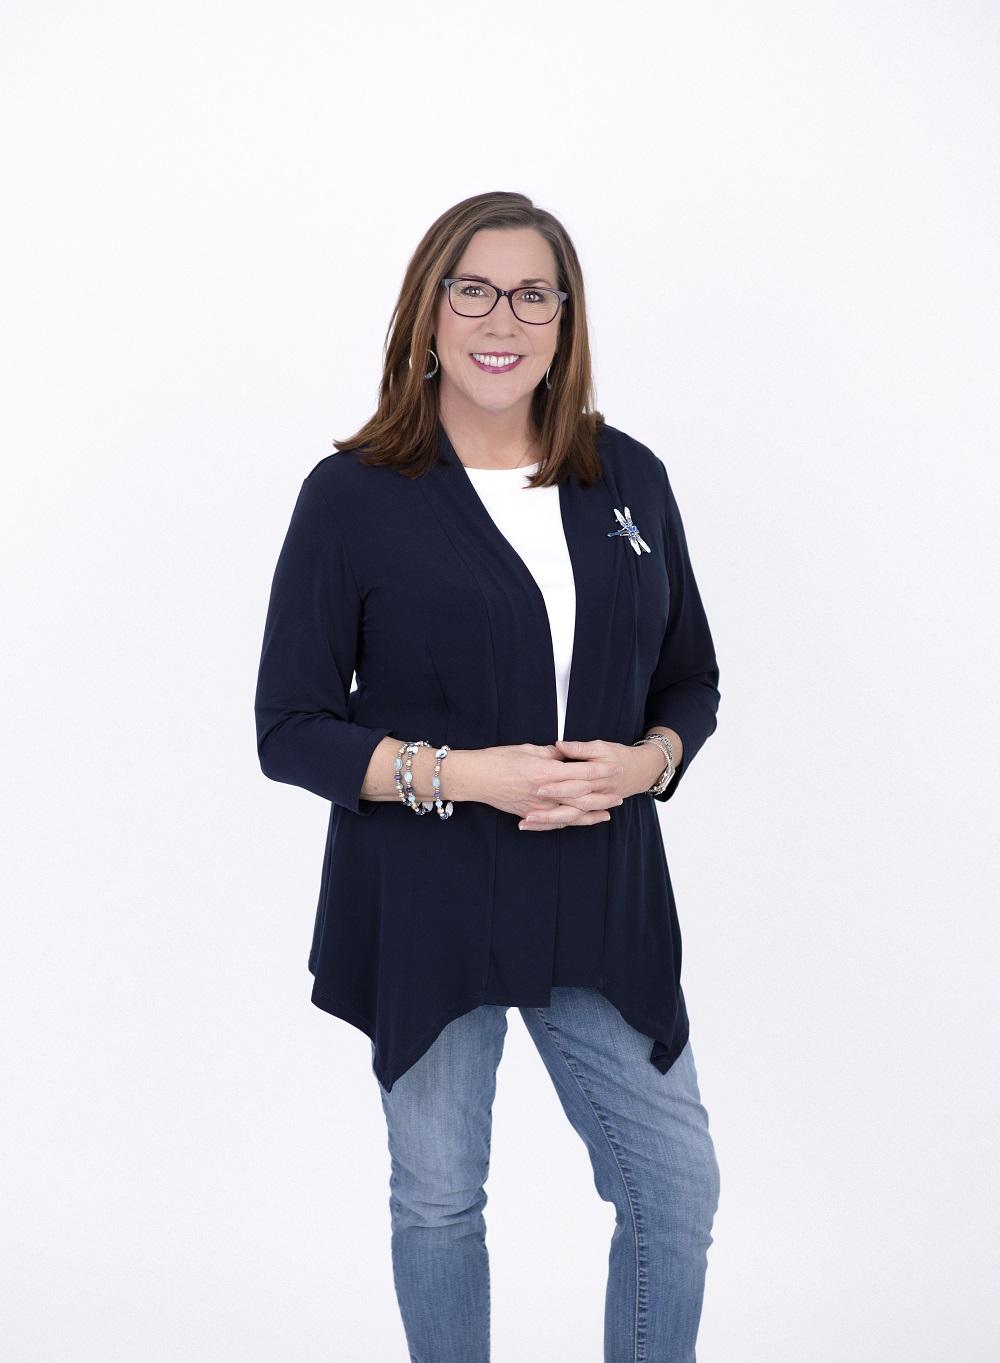 Diabetes Coach - Patricia Daiker Story